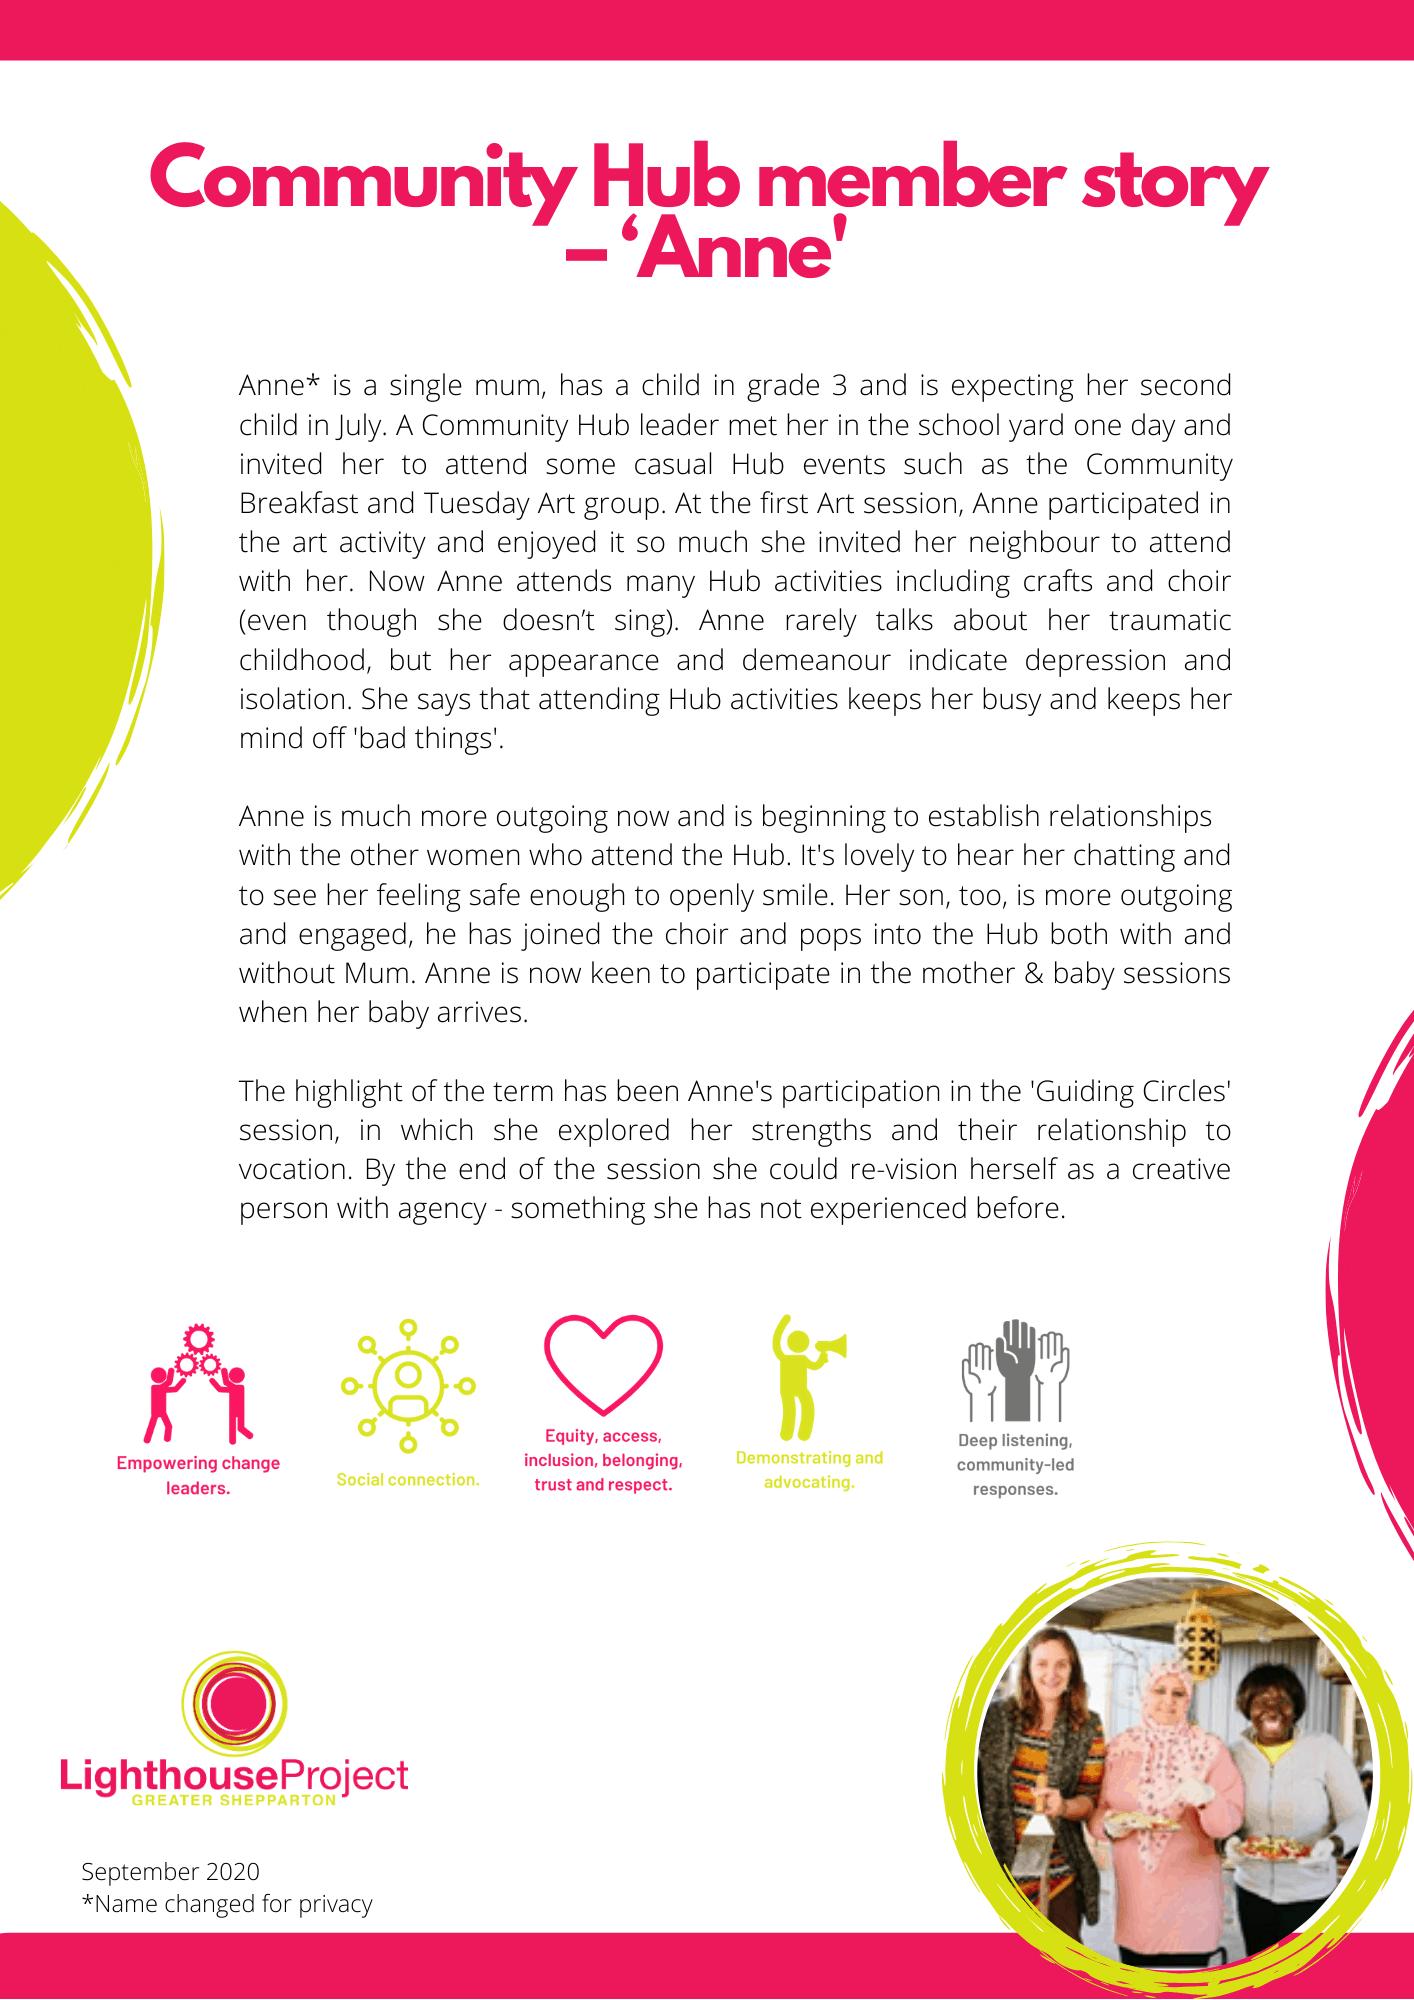 Community Hub Stories of Change Anne image